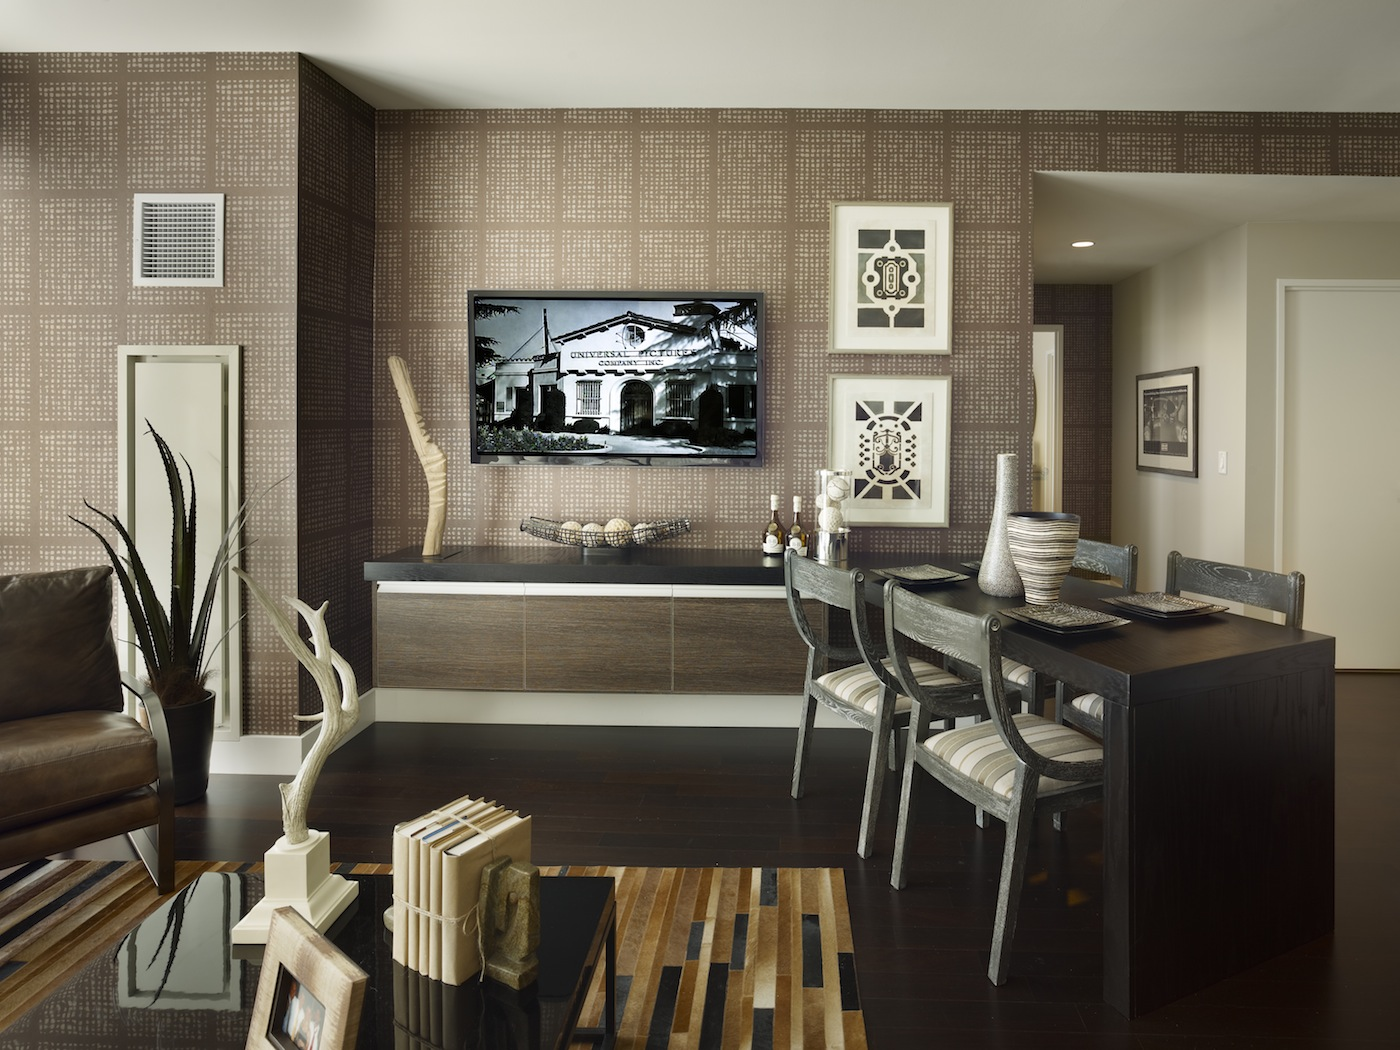 simple clean living room design and bedroom furniture sets city on the hudson – gacek group